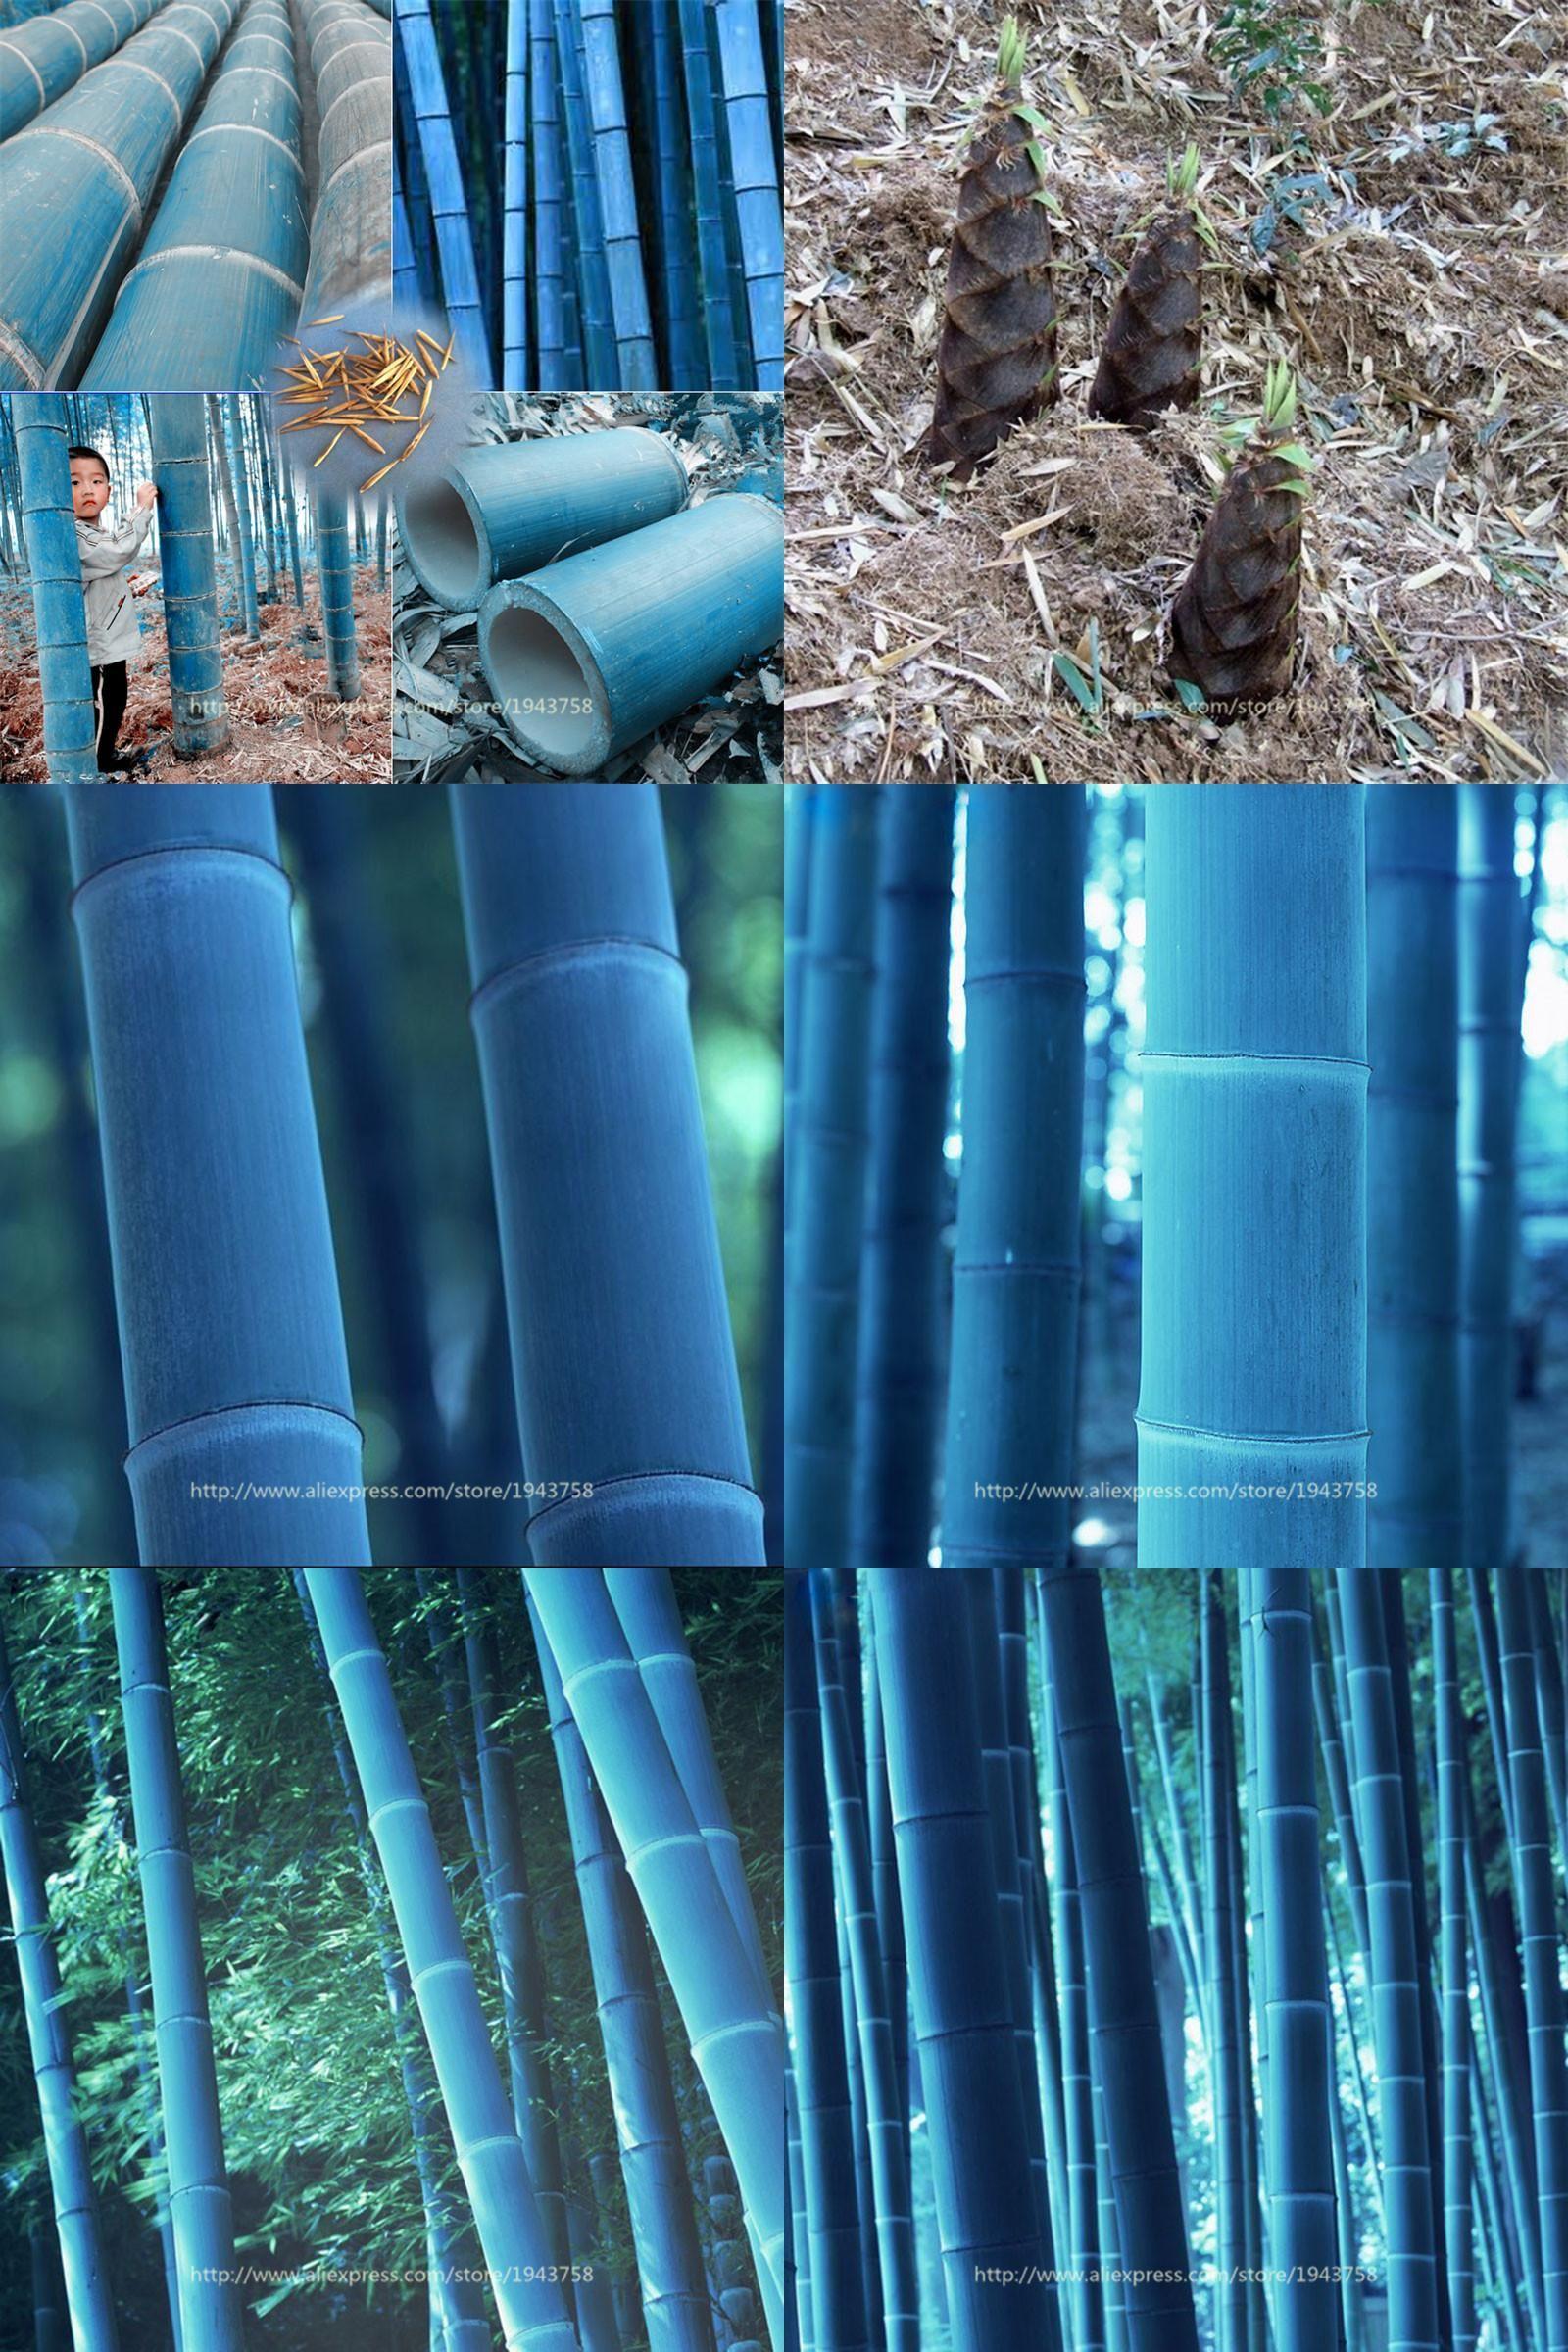 Visit to Buy] 20 pcs/bag Chinese Blue Bamboo Seeds,MOSO